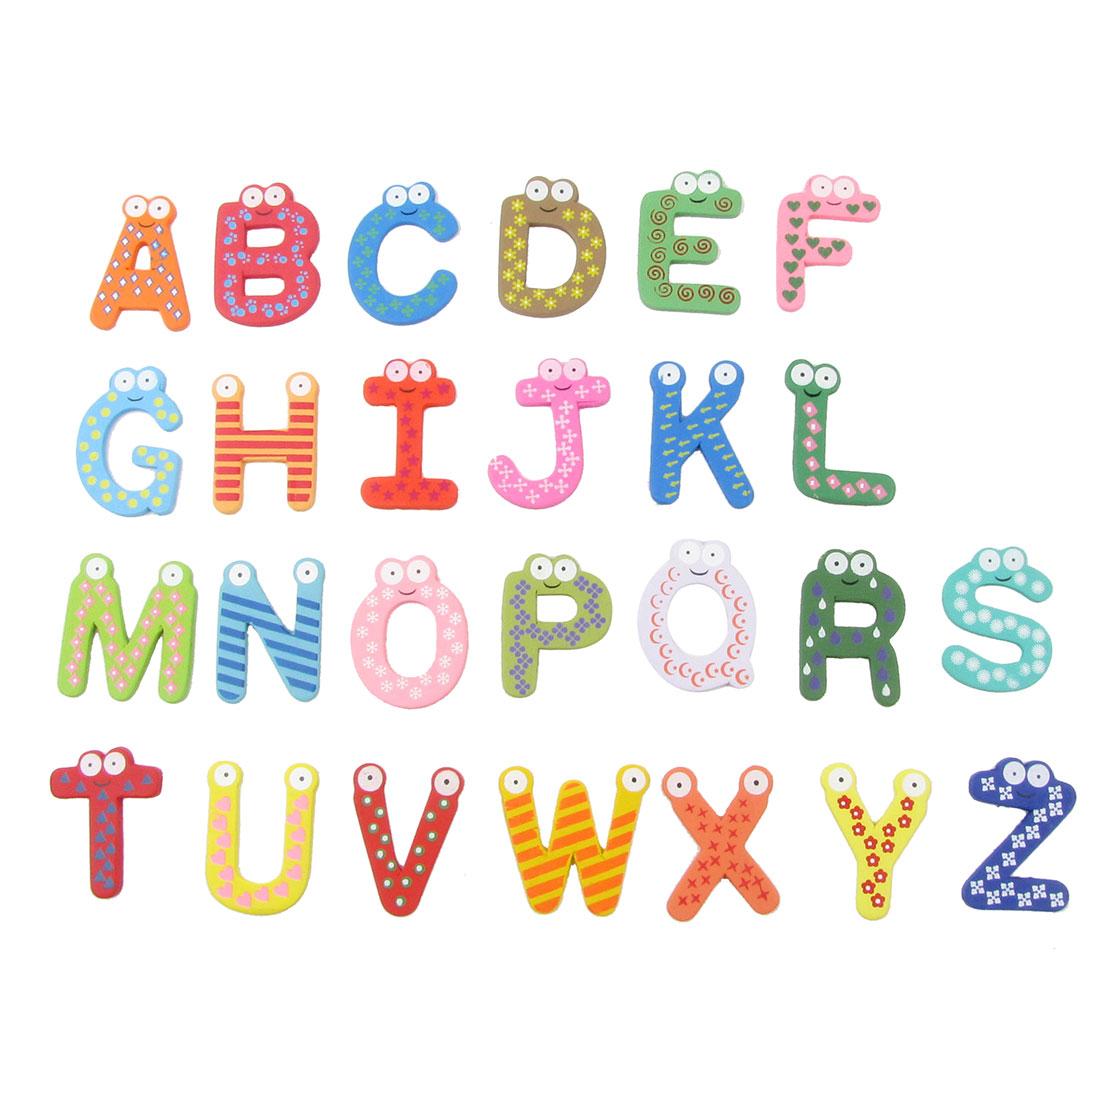 26 Pcs Fridge Refrigerator Colorful Wood Alphabet Design Magnetic Decor Sticker